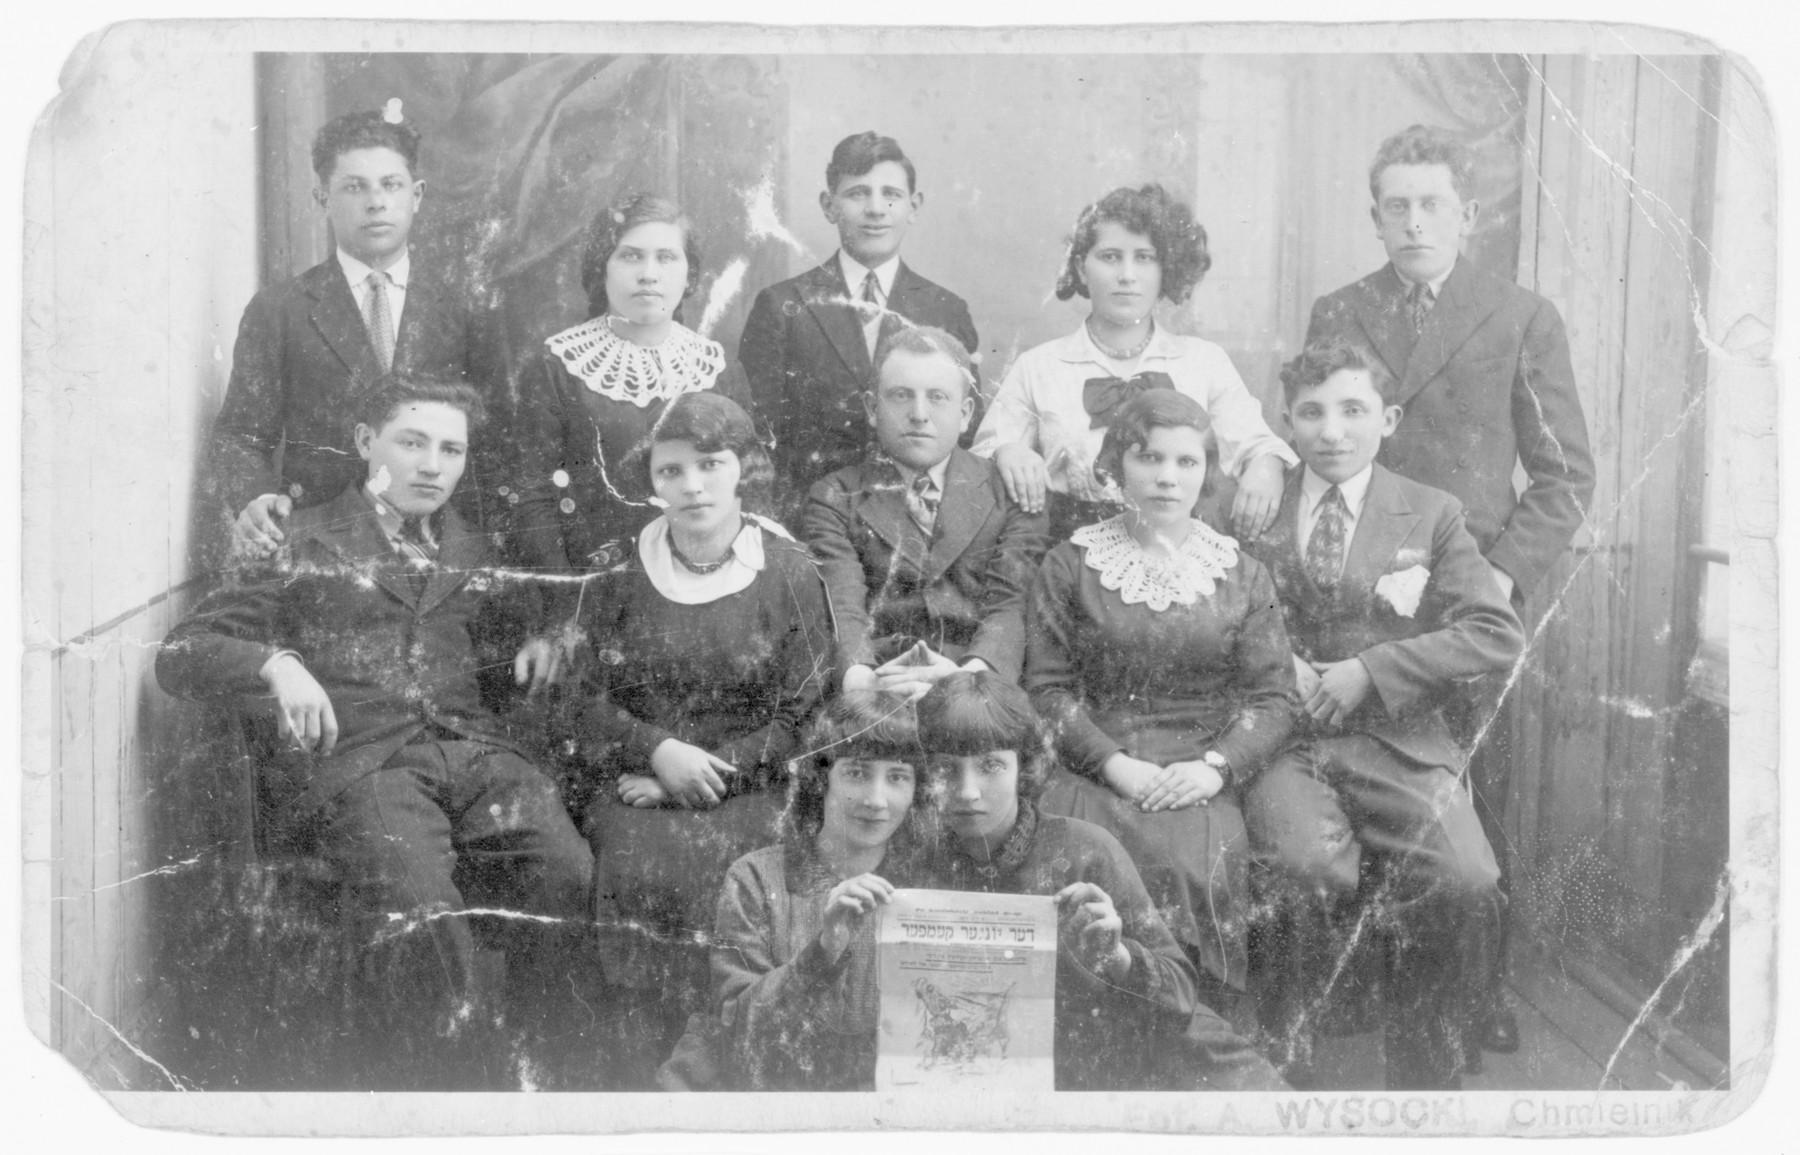 Members of the Bundist youth movement in Chmielnik.